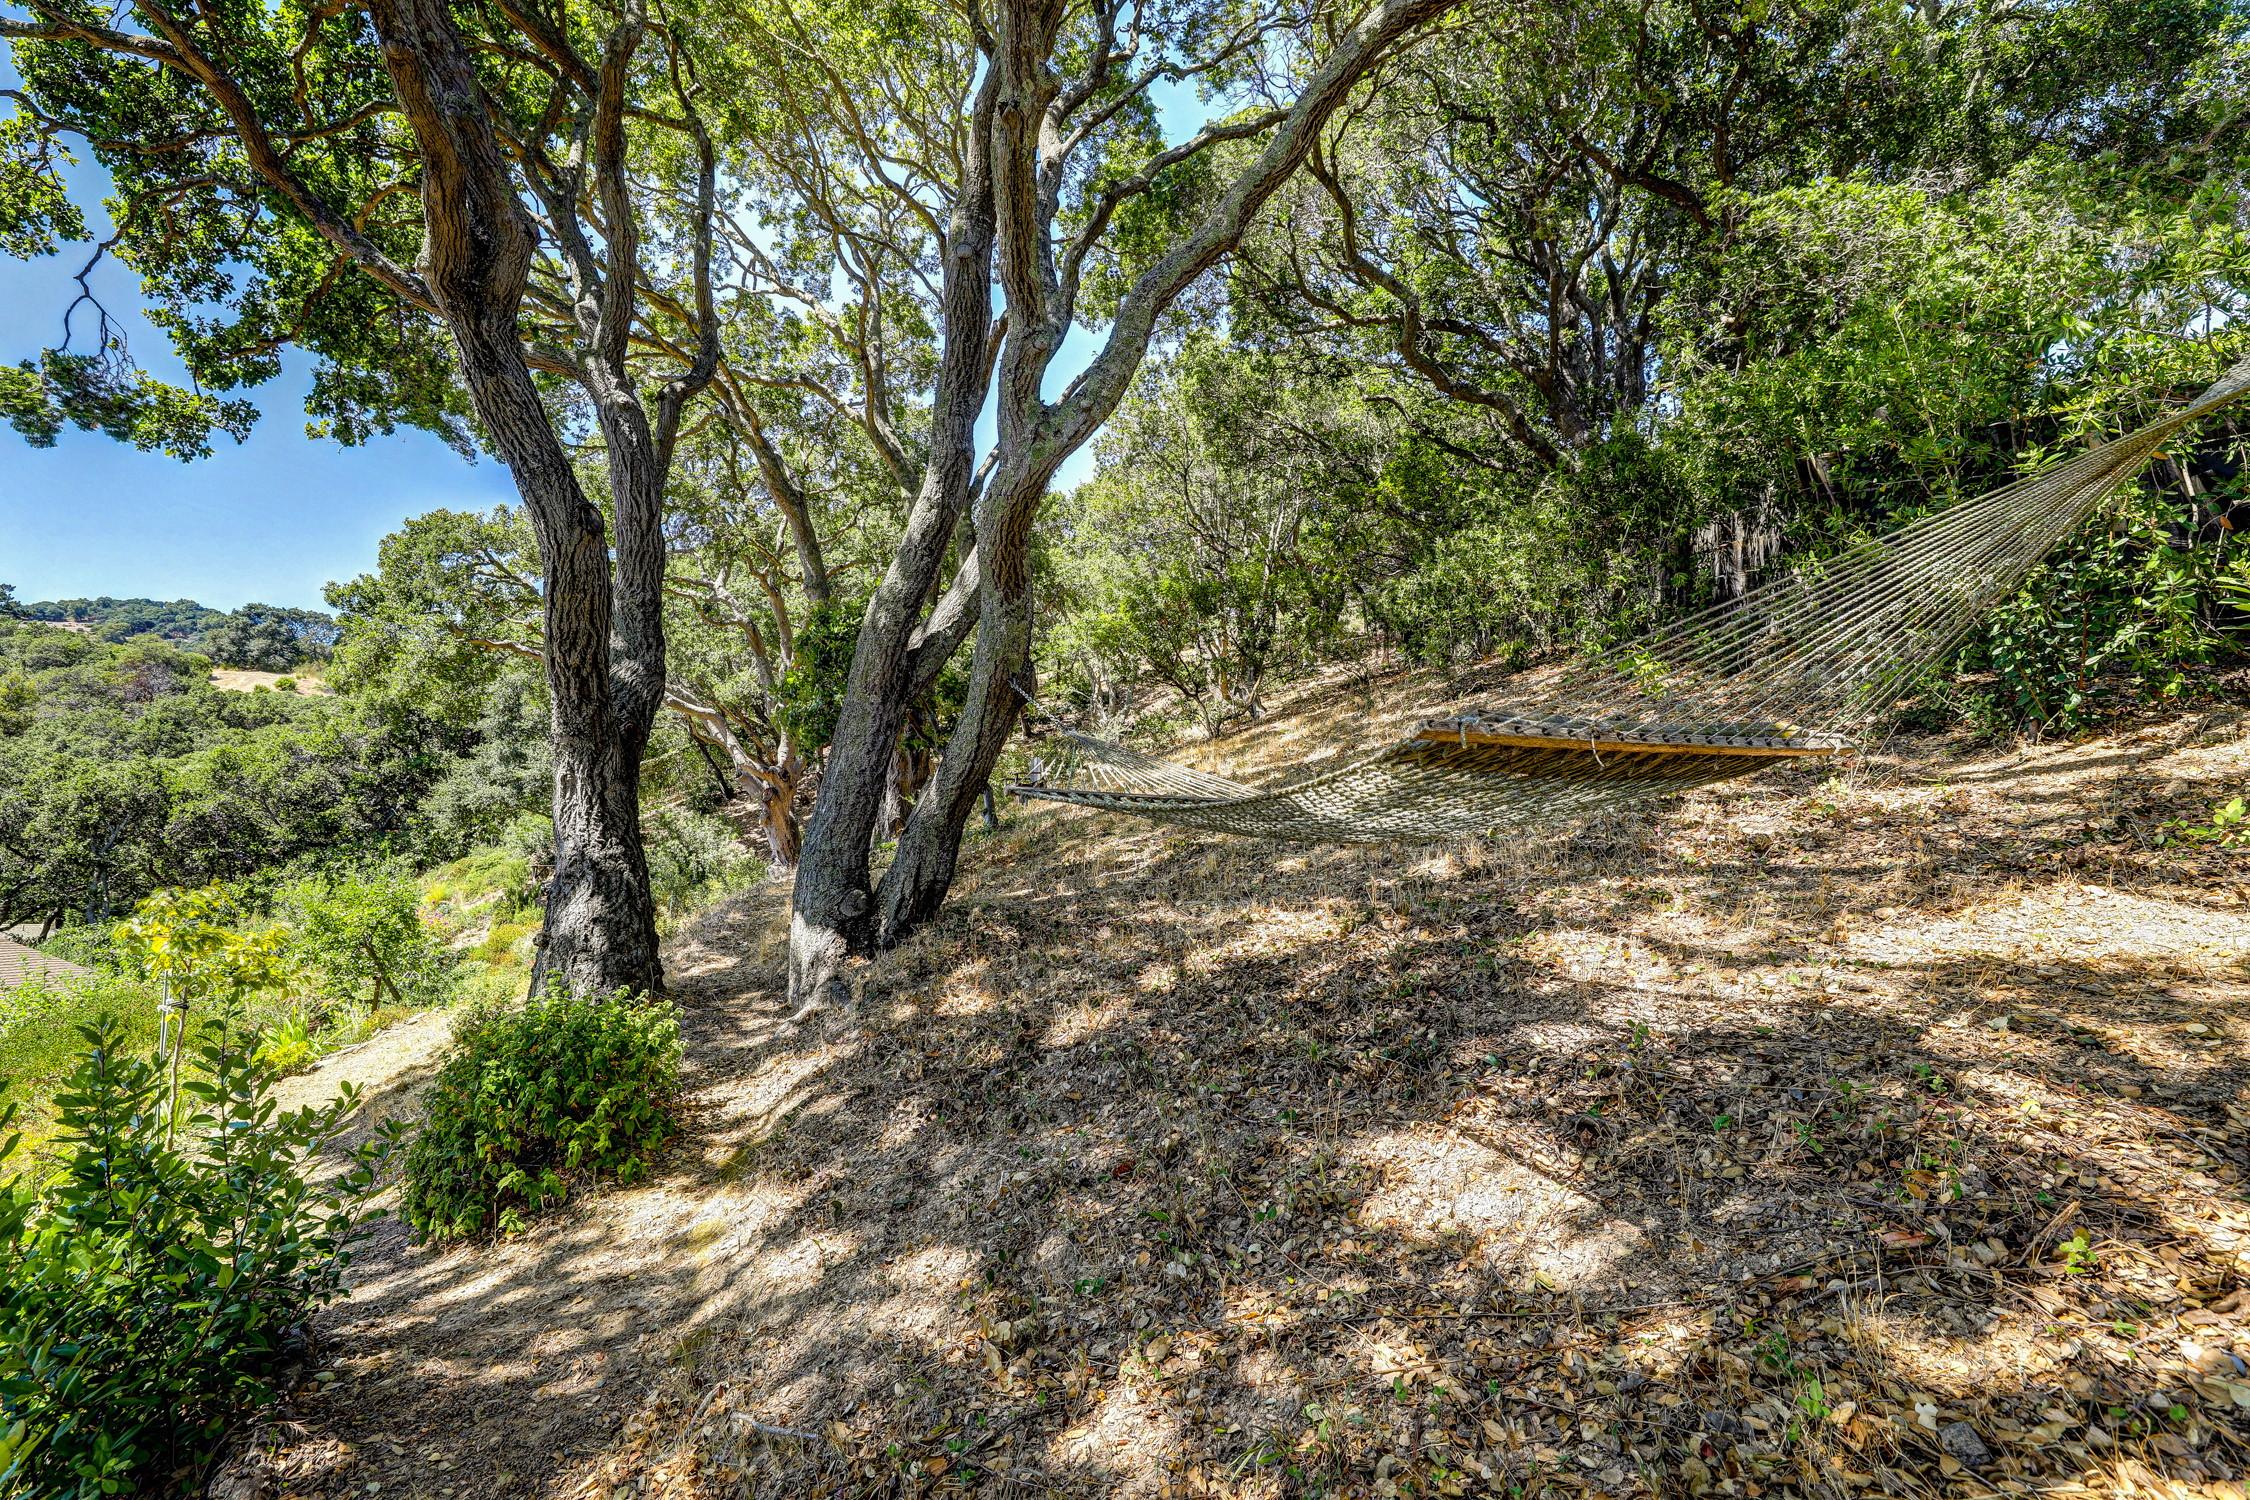 16Dorian 78 MLSSan Rafael Real Estate - Listed by Julia Fitzpatrick + Allie Fornesi Team Own Marin County .jpg